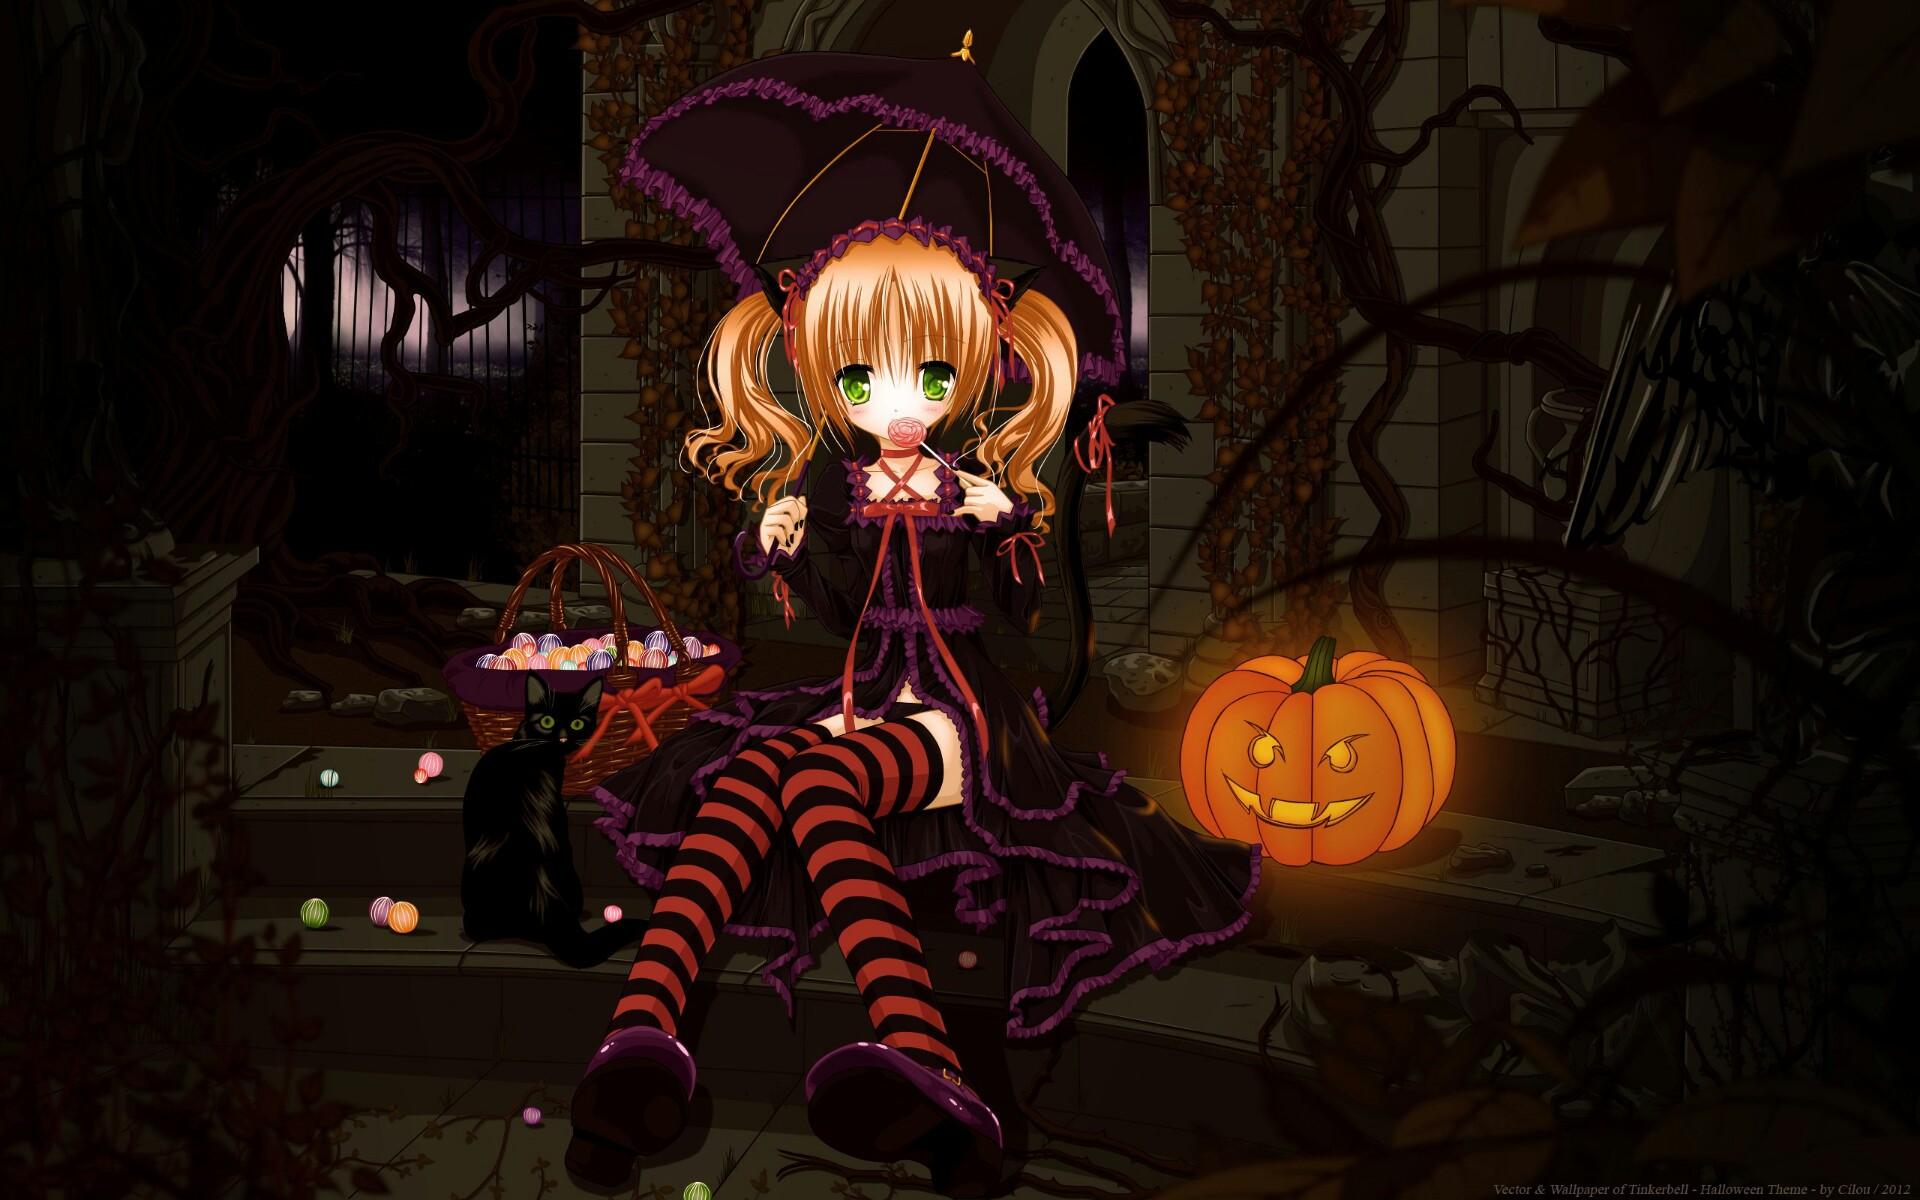 Computer Lock Screen Wallpapers Girls Cute Halloween Anime Wallpaper Hd 2018 Wallpapers Hd